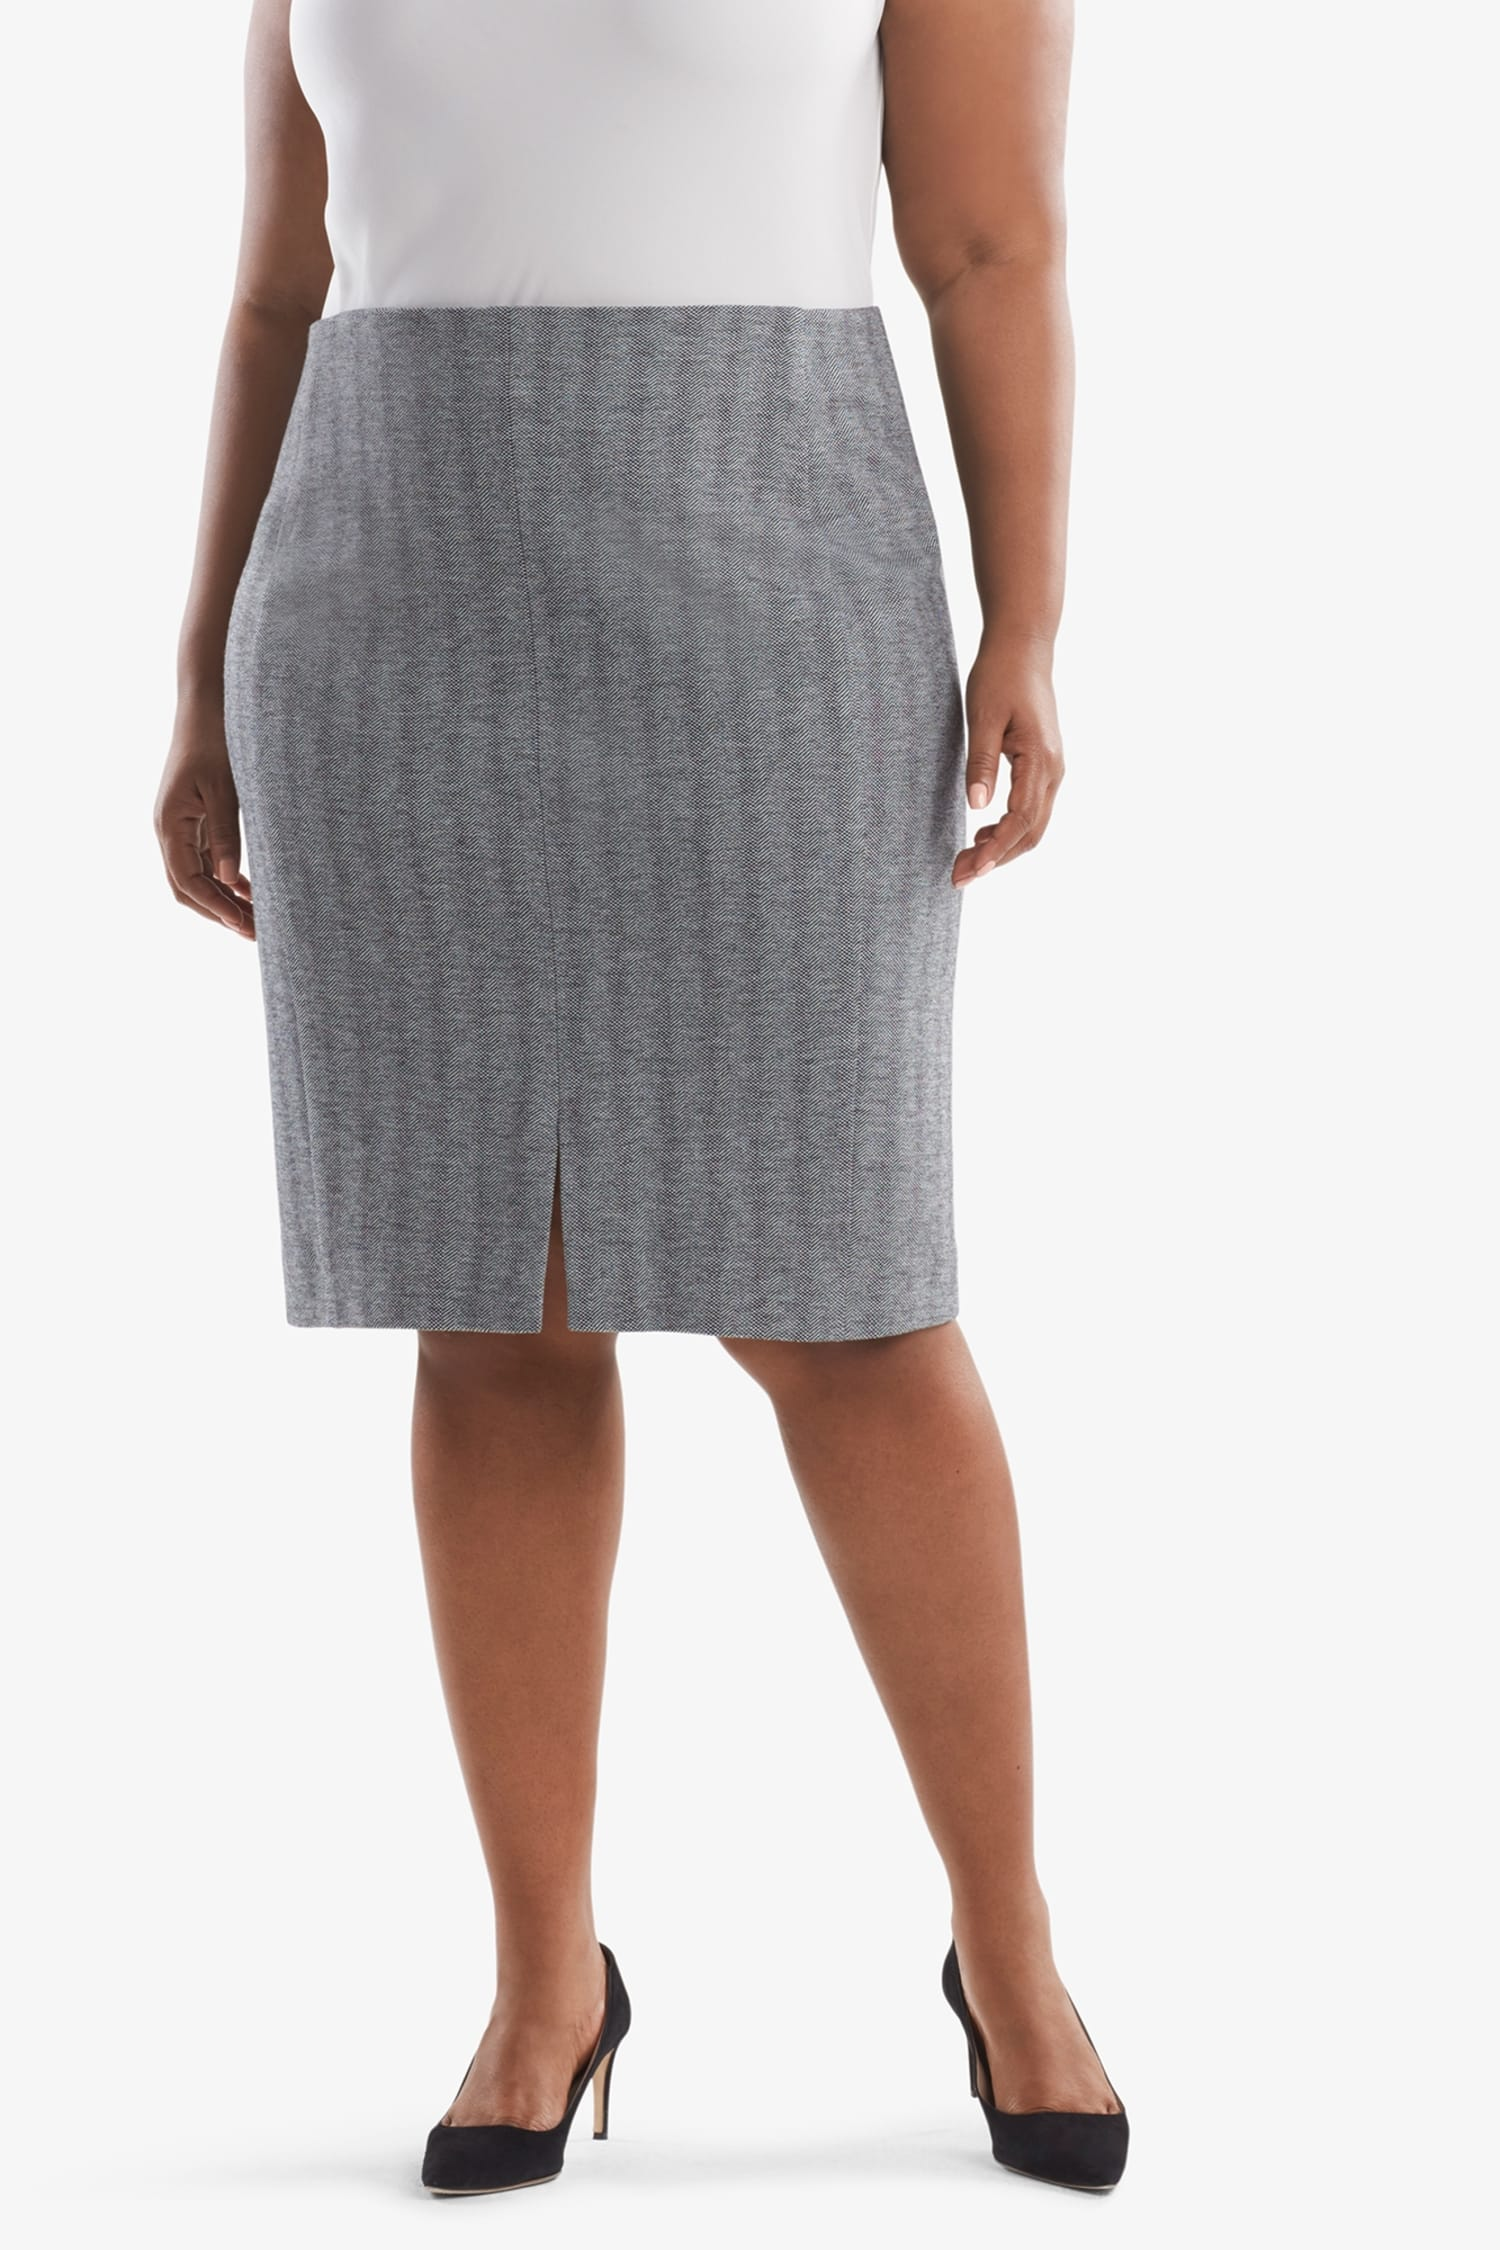 9b513d5d641 Greenpoint Skirt—Zip Jacquard - White / Black | MM.LaFleur